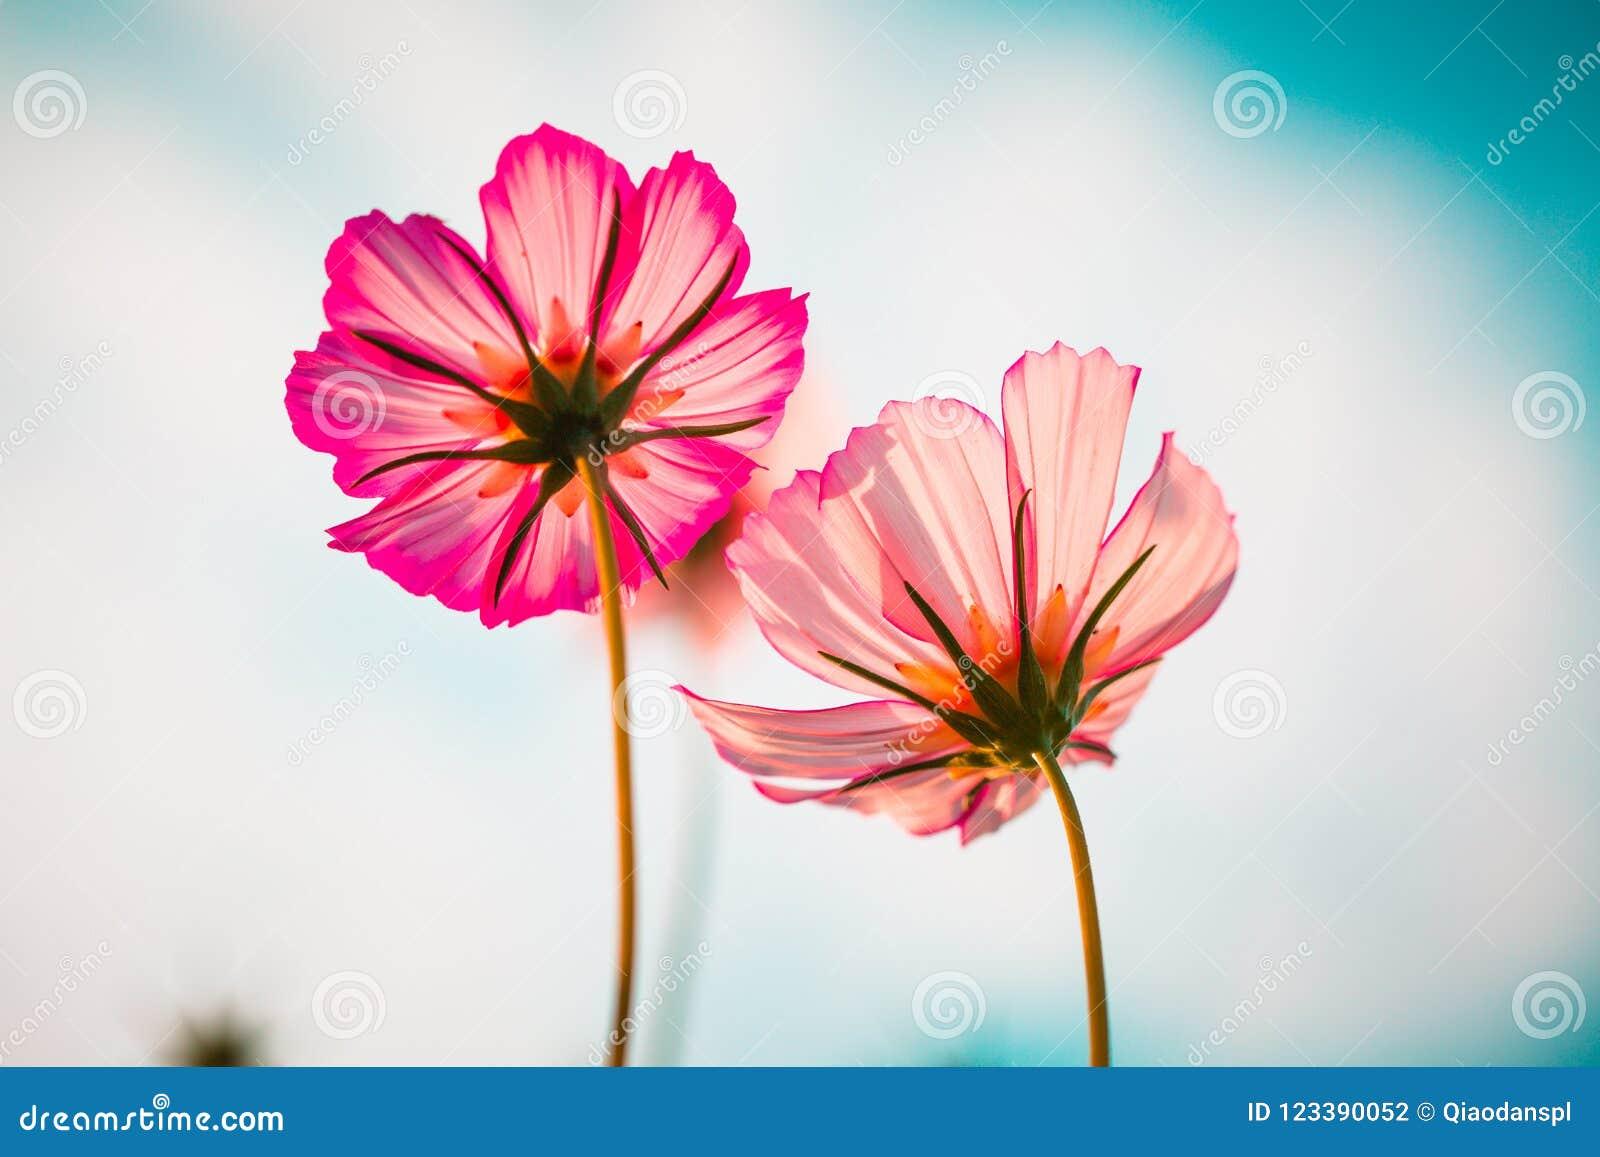 Cosmos bipinnata cav flower pink stock photo image of head flower download cosmos bipinnata cav flower pink stock photo image of head flower 123390052 izmirmasajfo